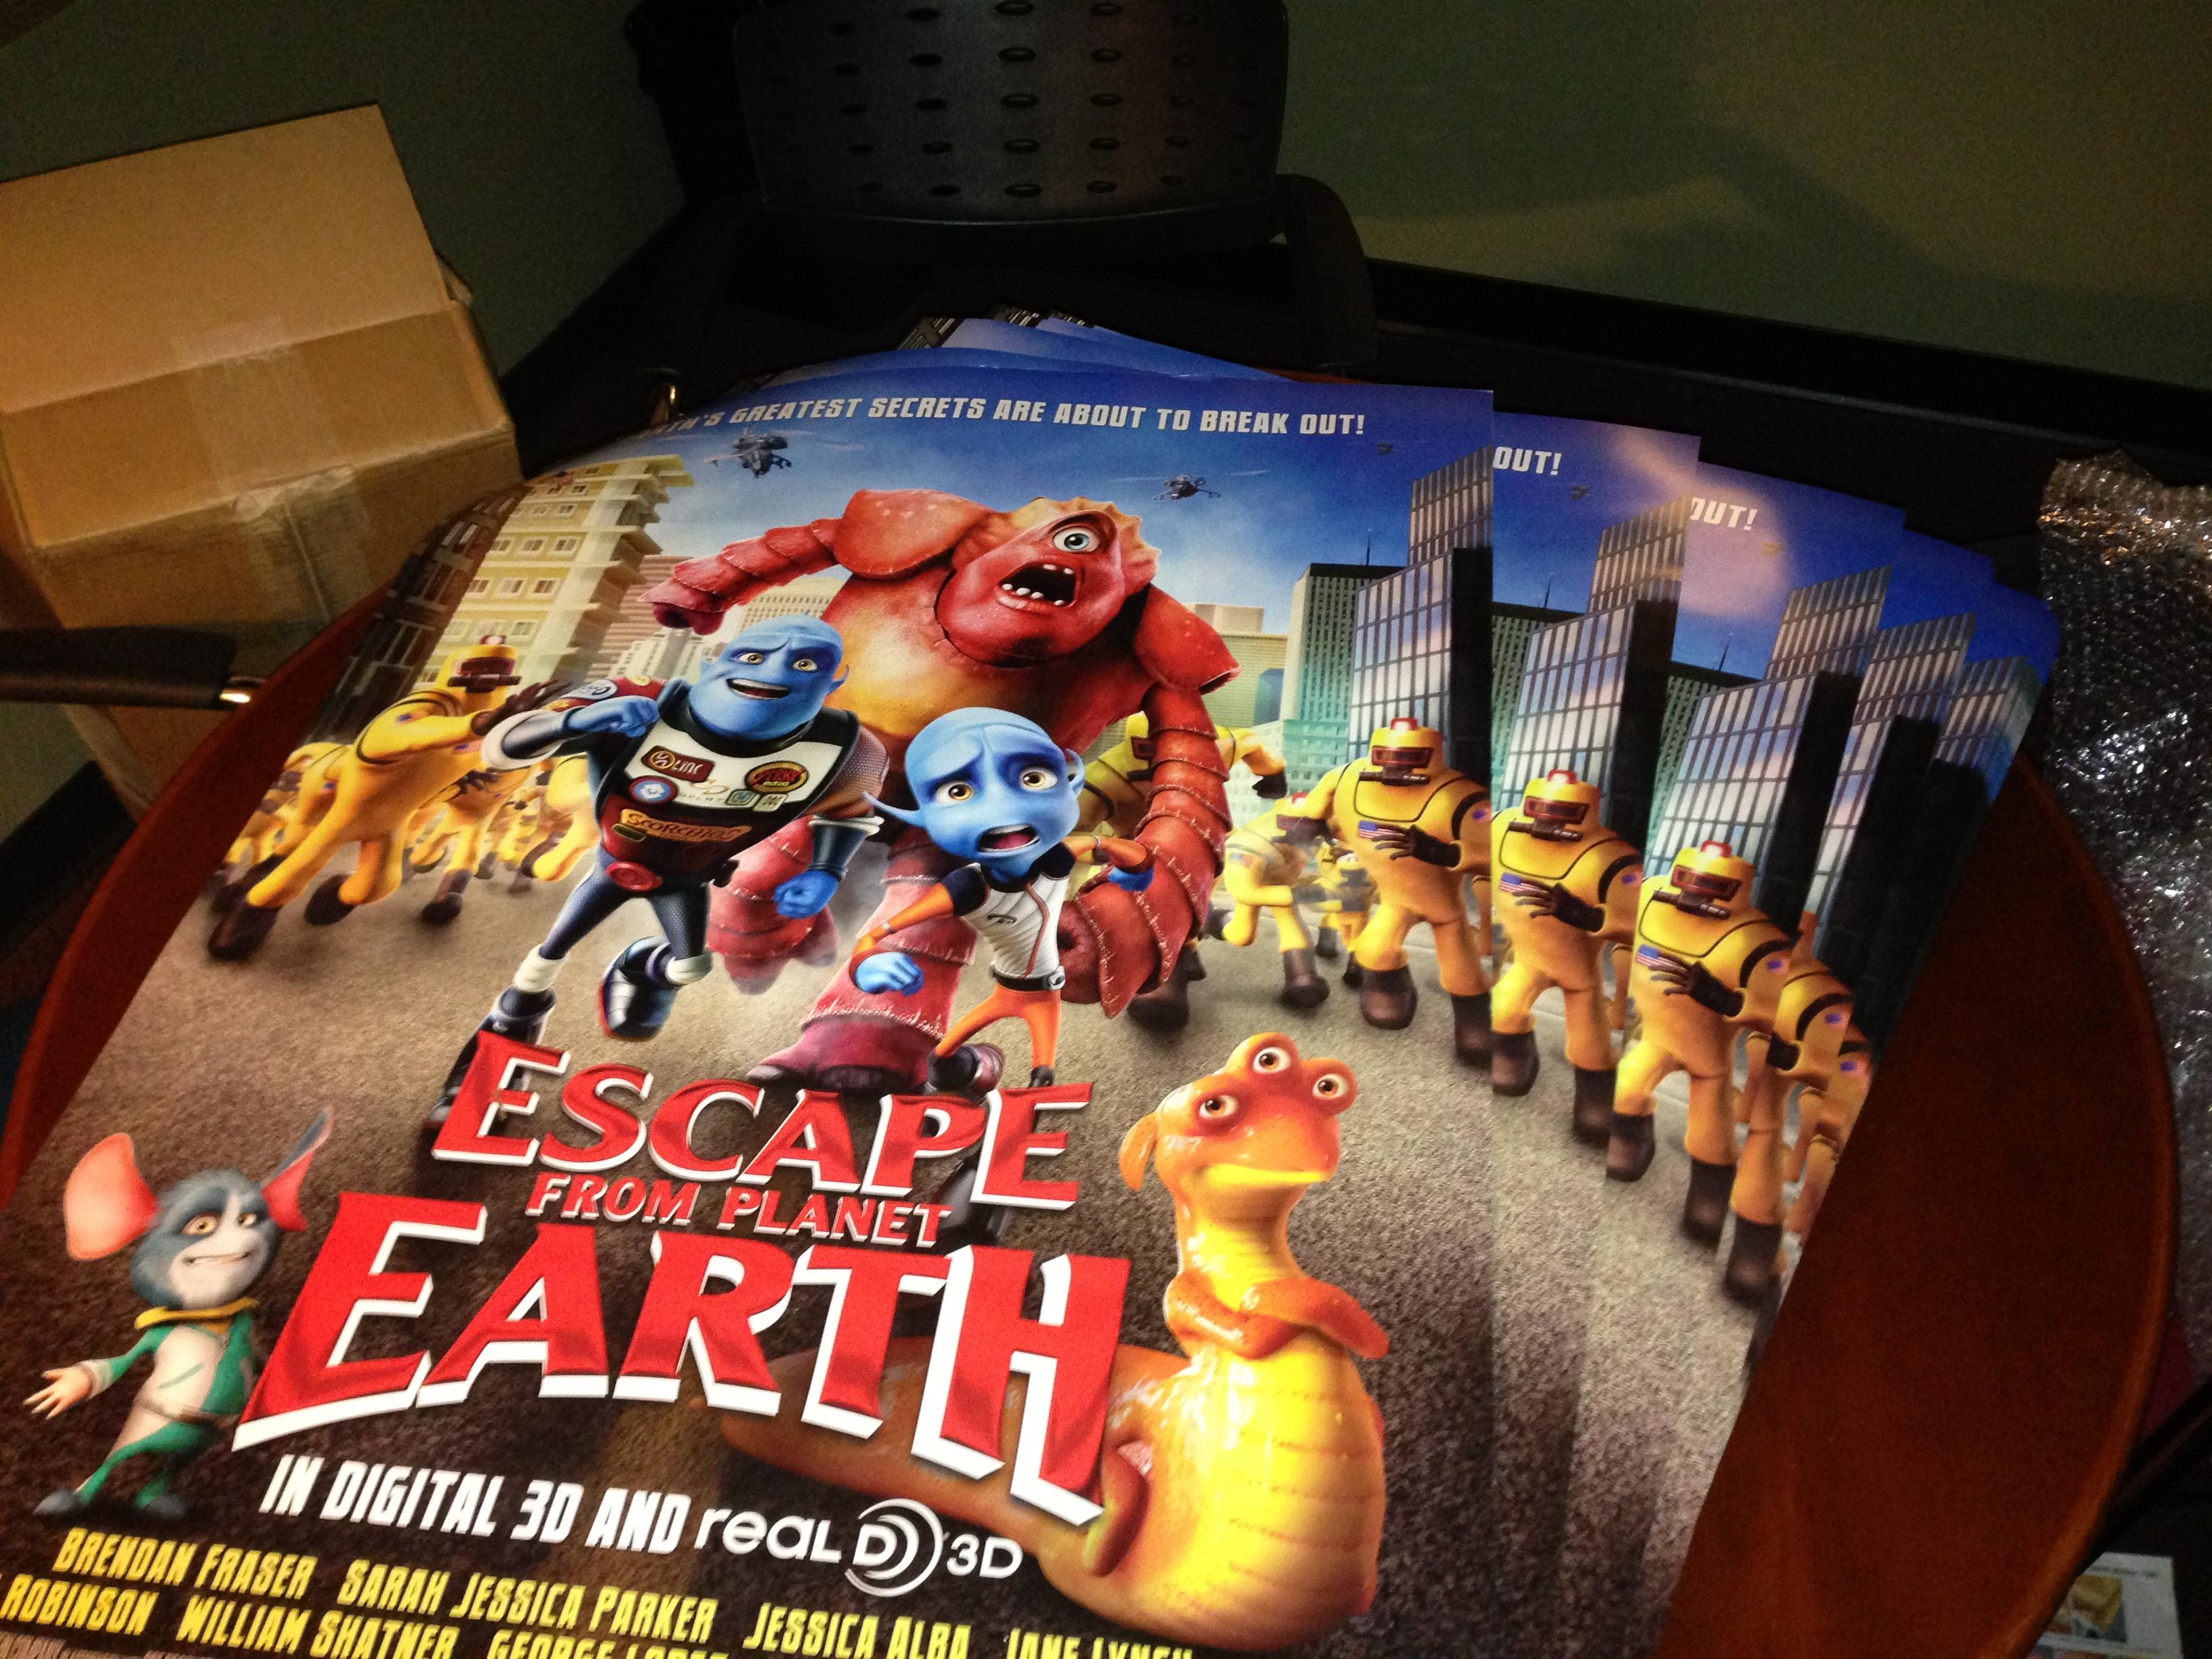 Big stack 'o posters